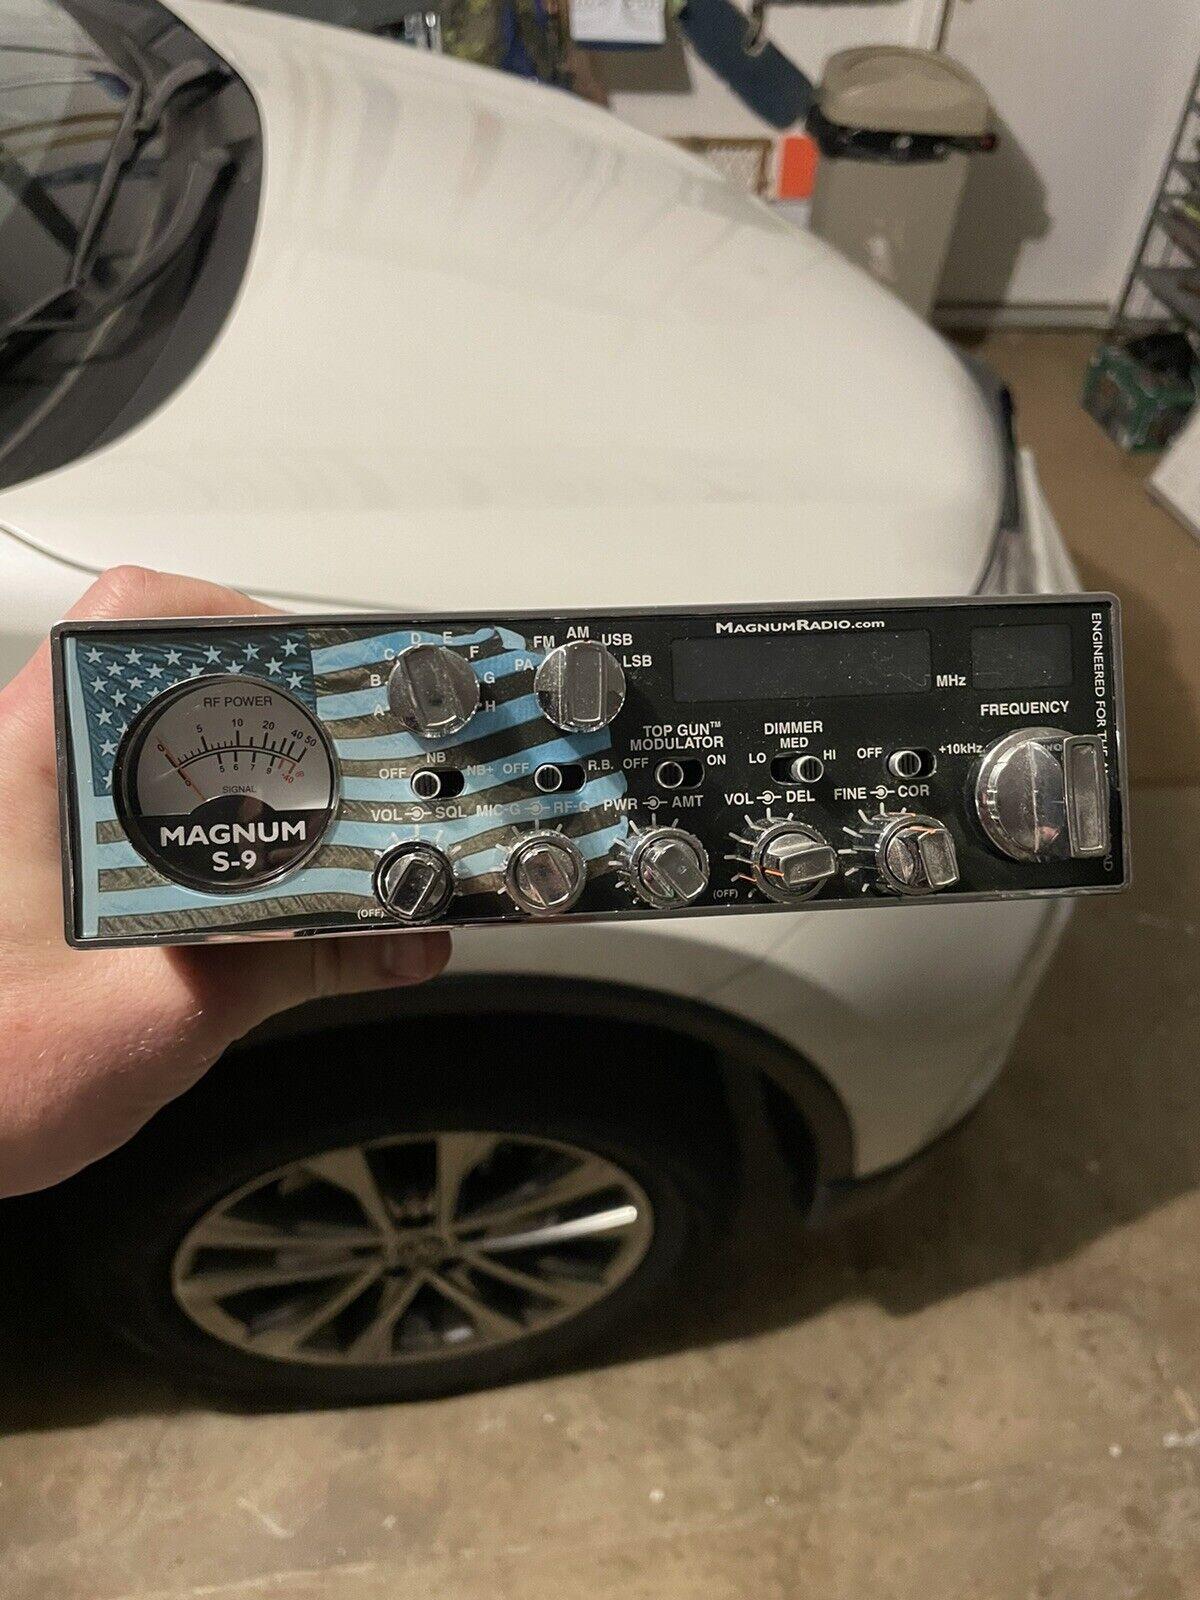 magnum s9 radio. Buy it now for 800.00